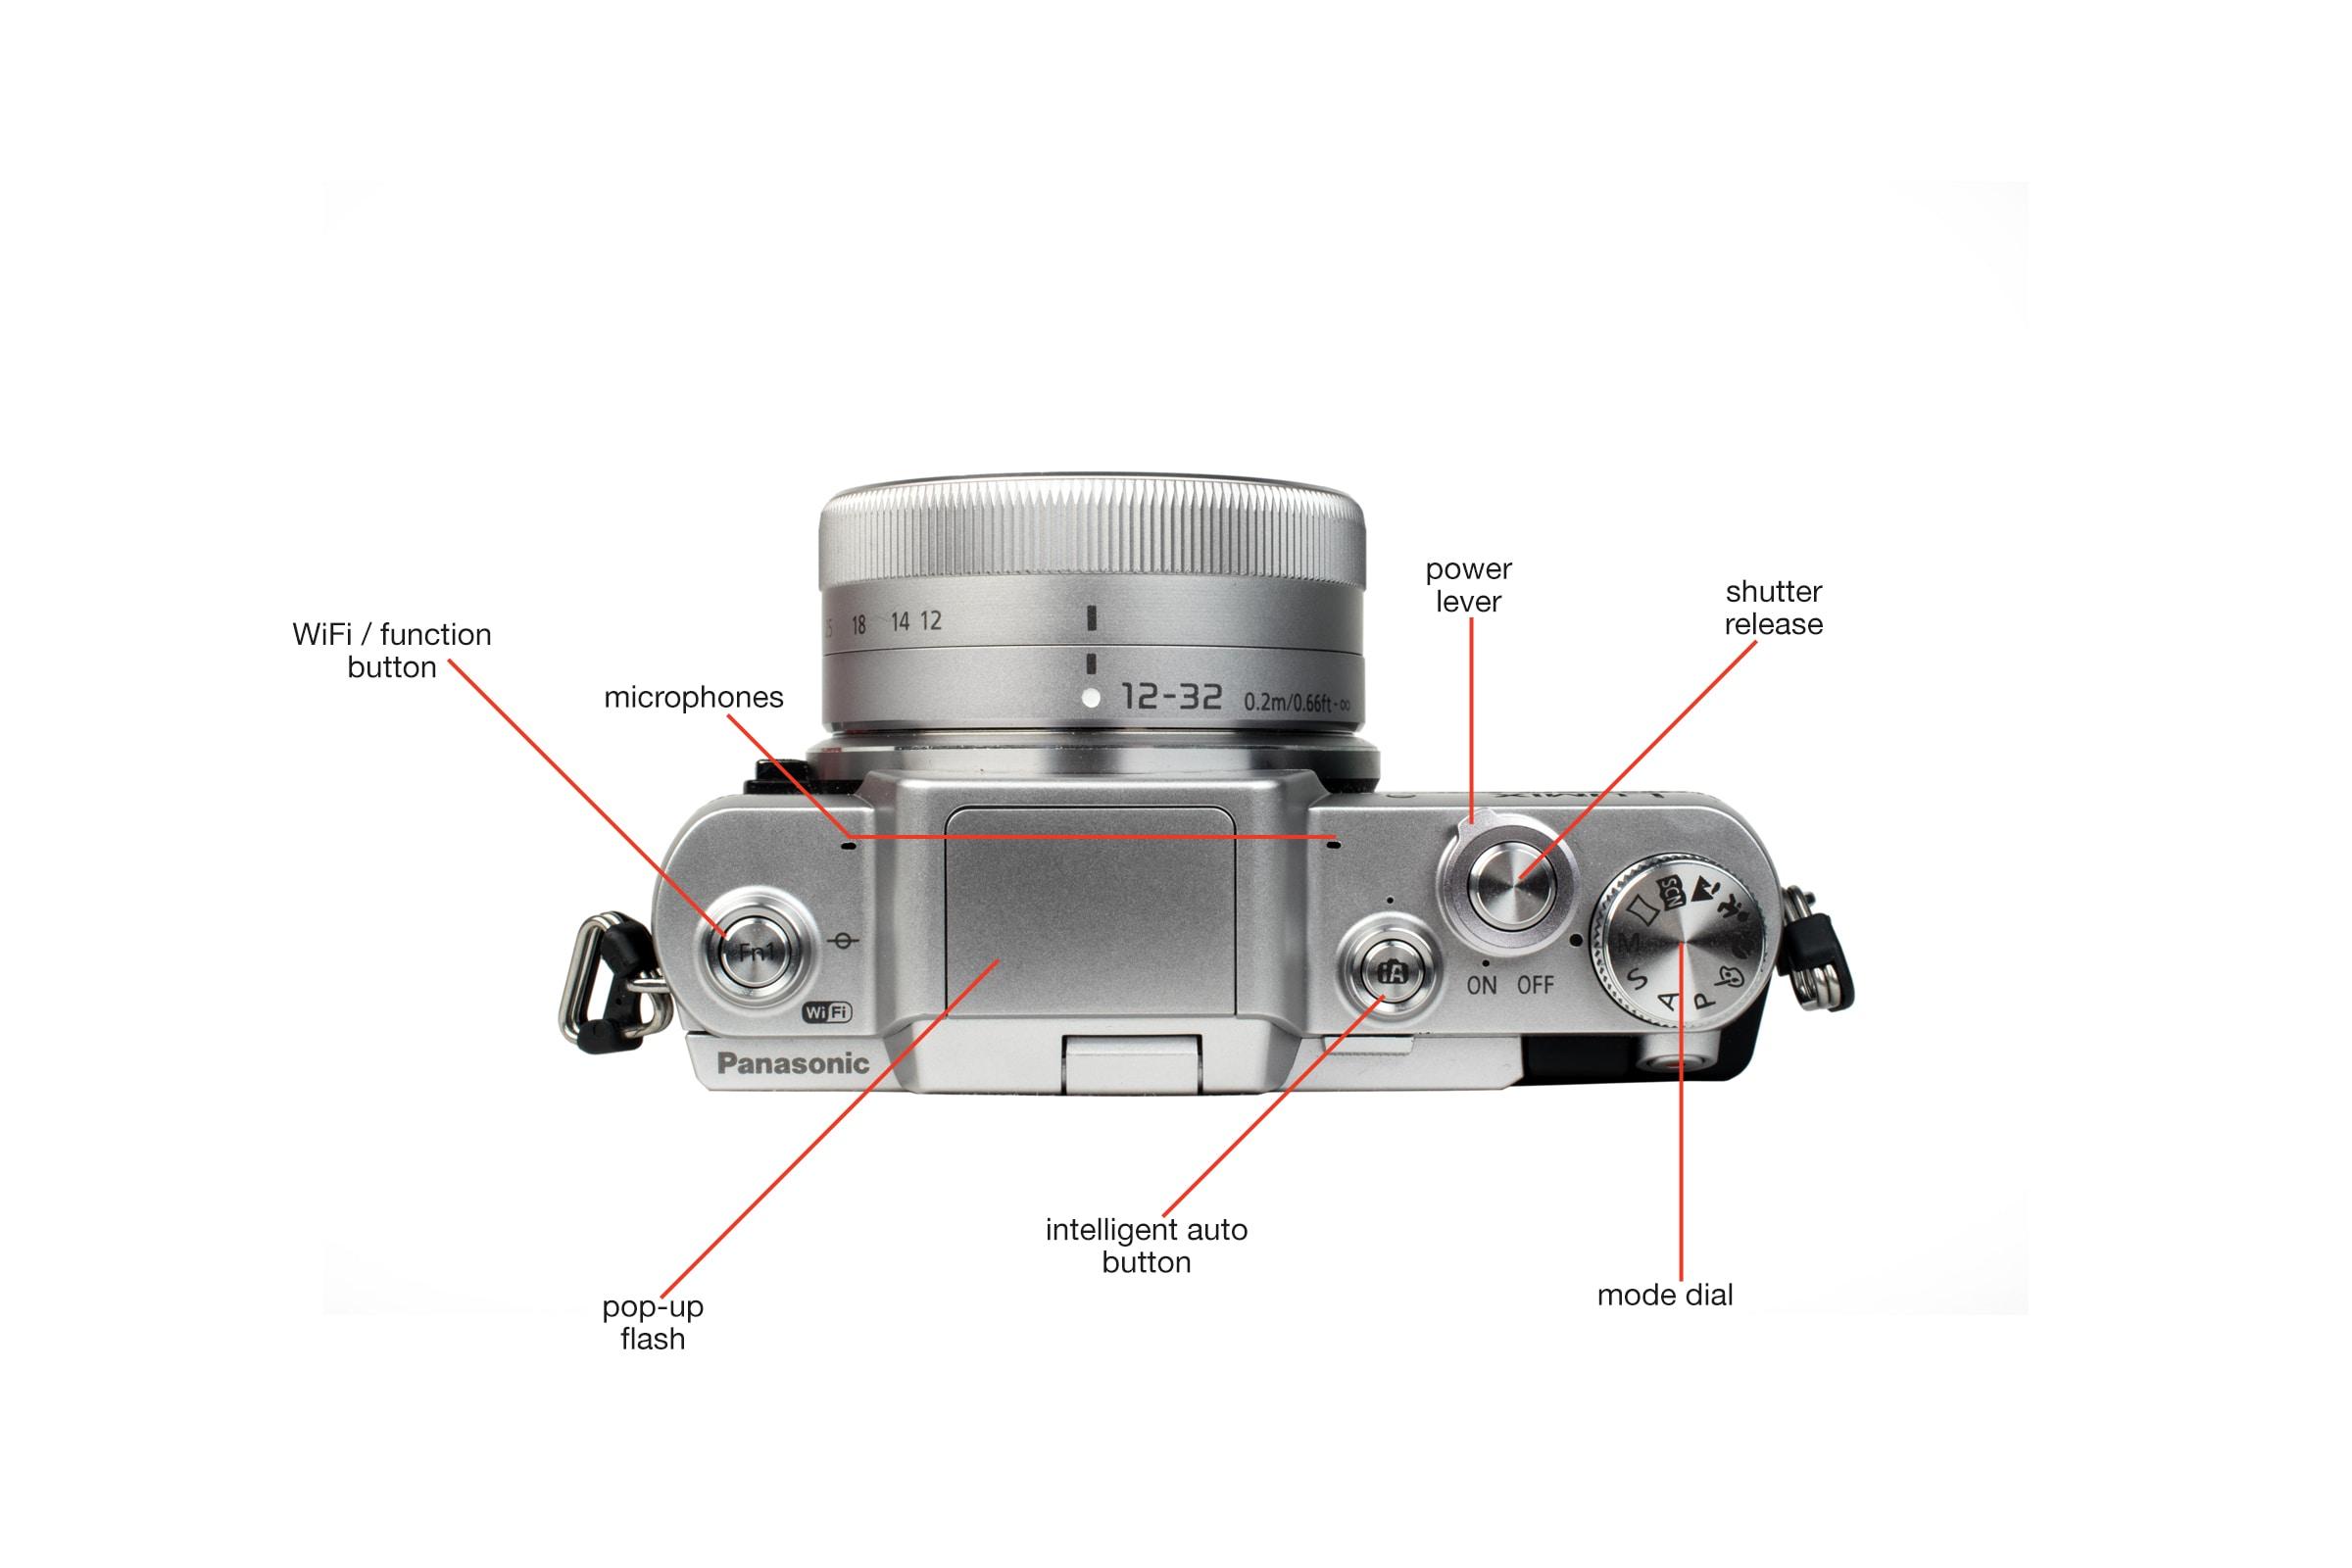 Top view of the Panasonic Lumix DMC GF7 .